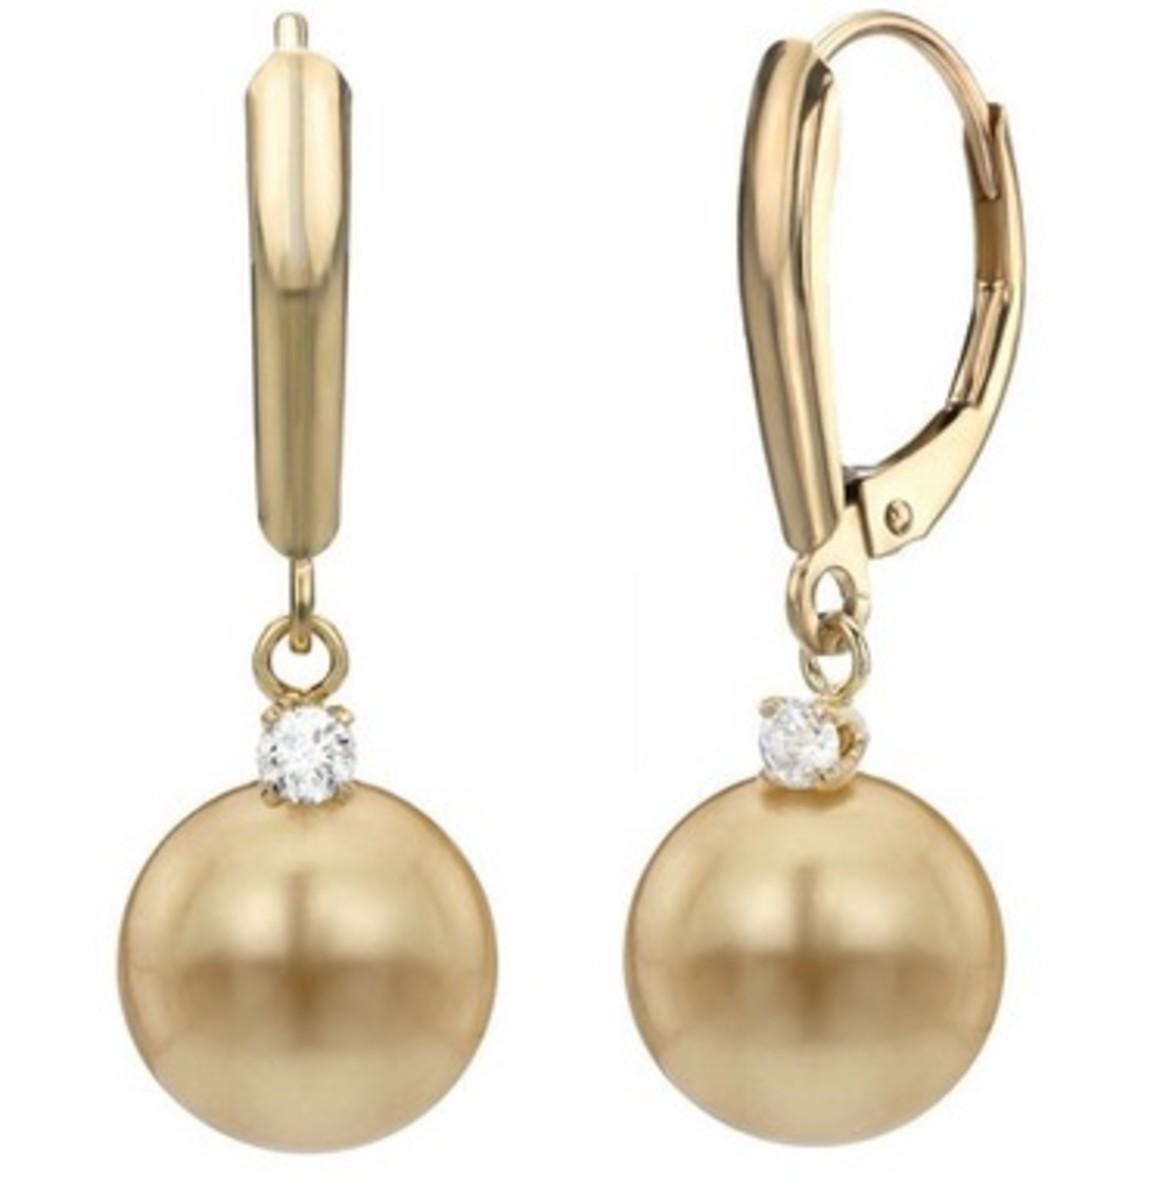 Cheaper lever-back golden South Sea pearl earrings